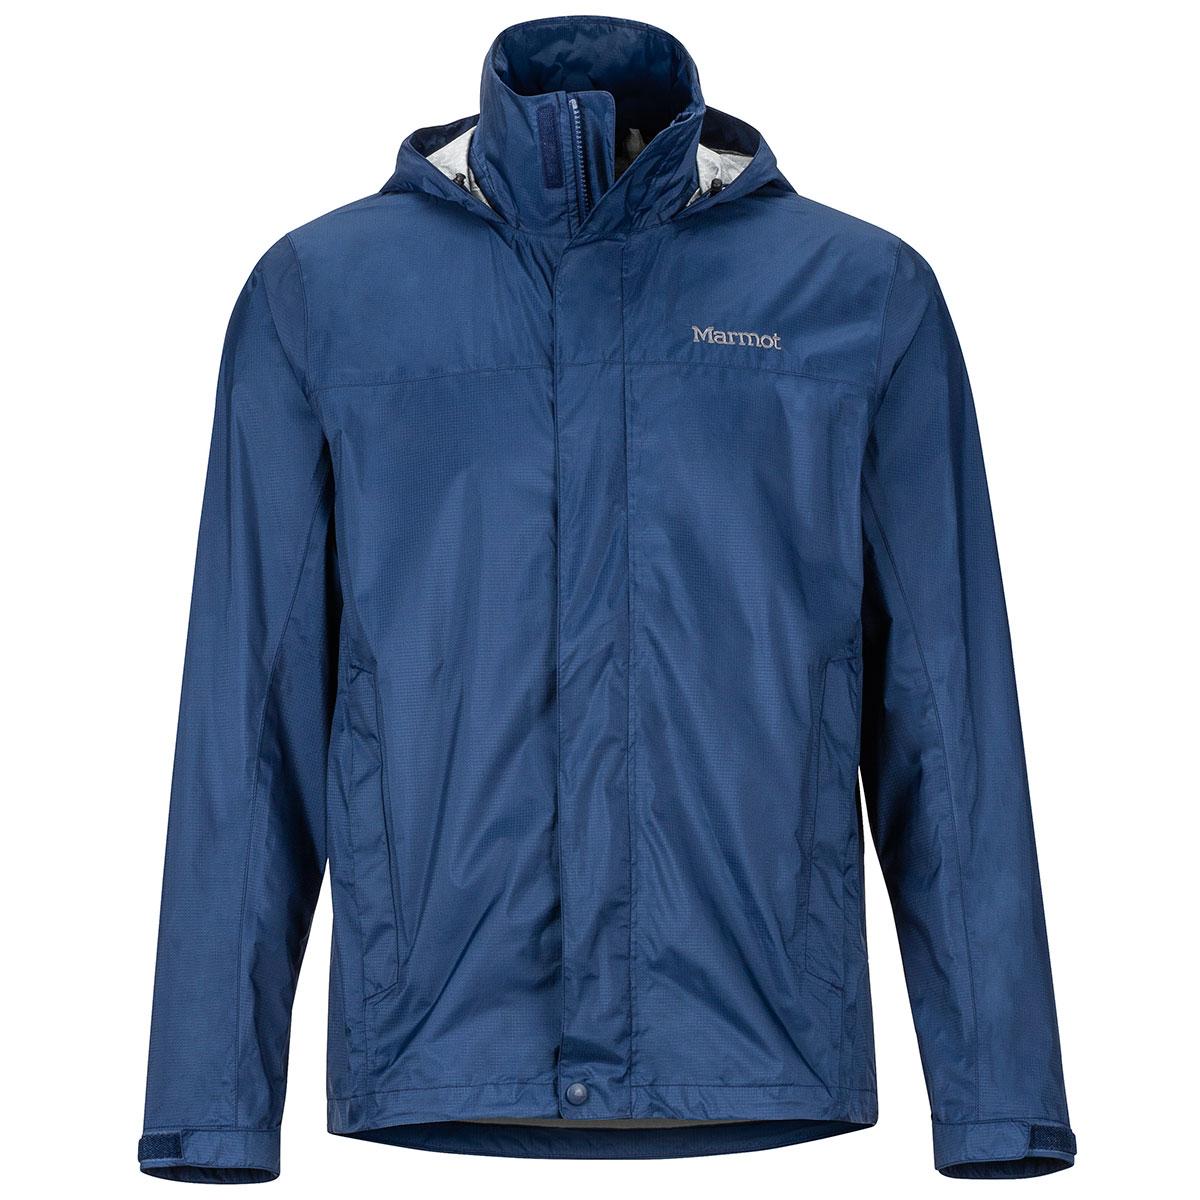 Marmot Men's Precip Eco Jacket - Blue, S